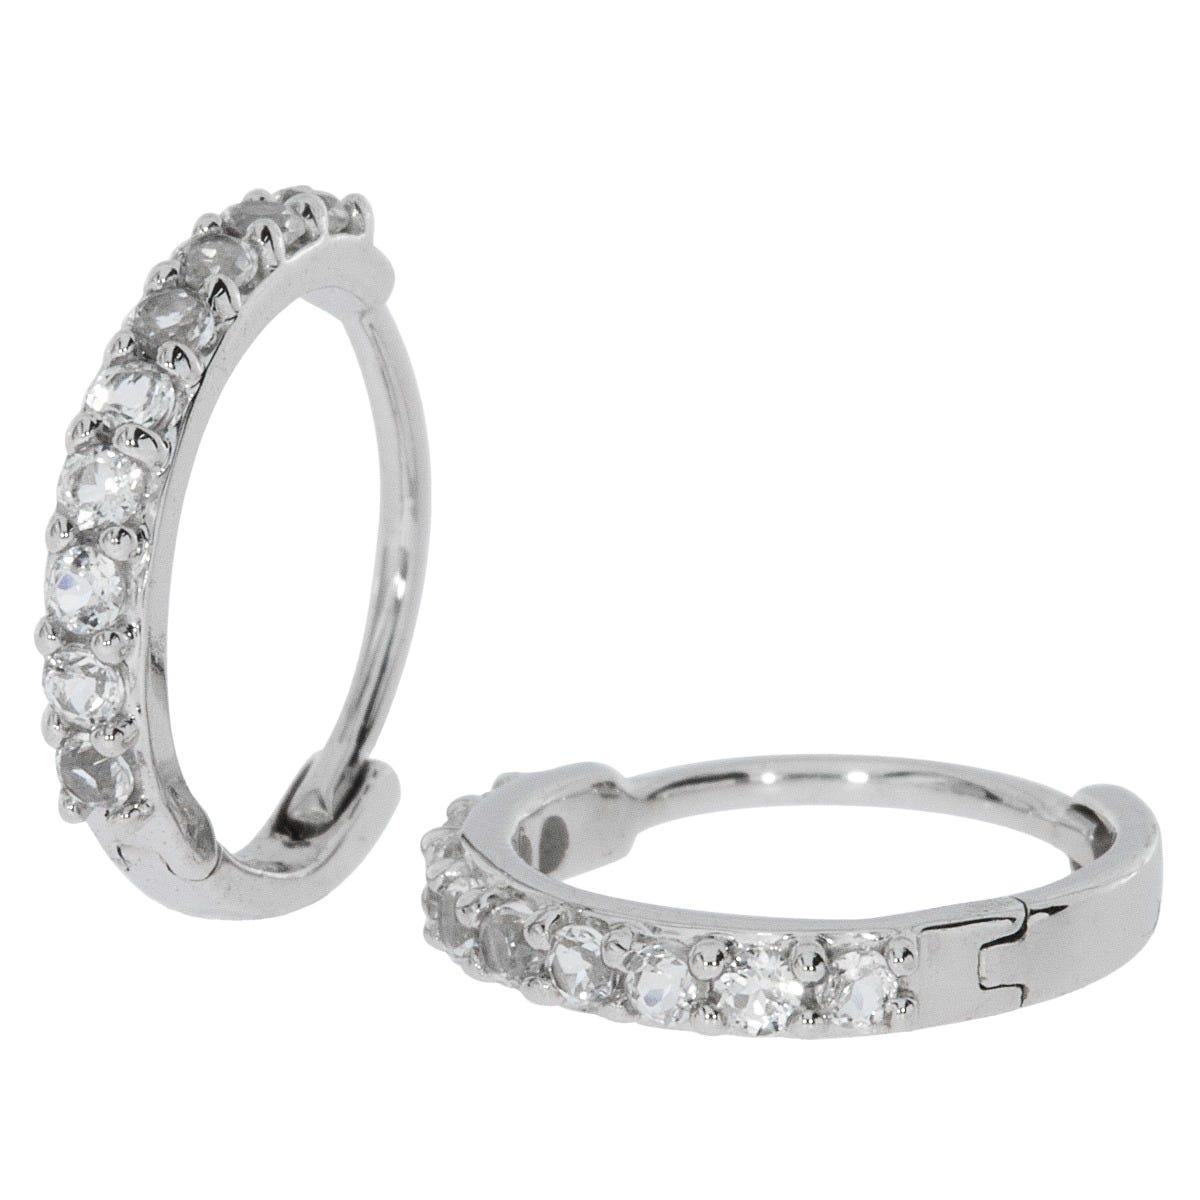 Diamond .19ctw. Huggie Earrings in 14k White Gold